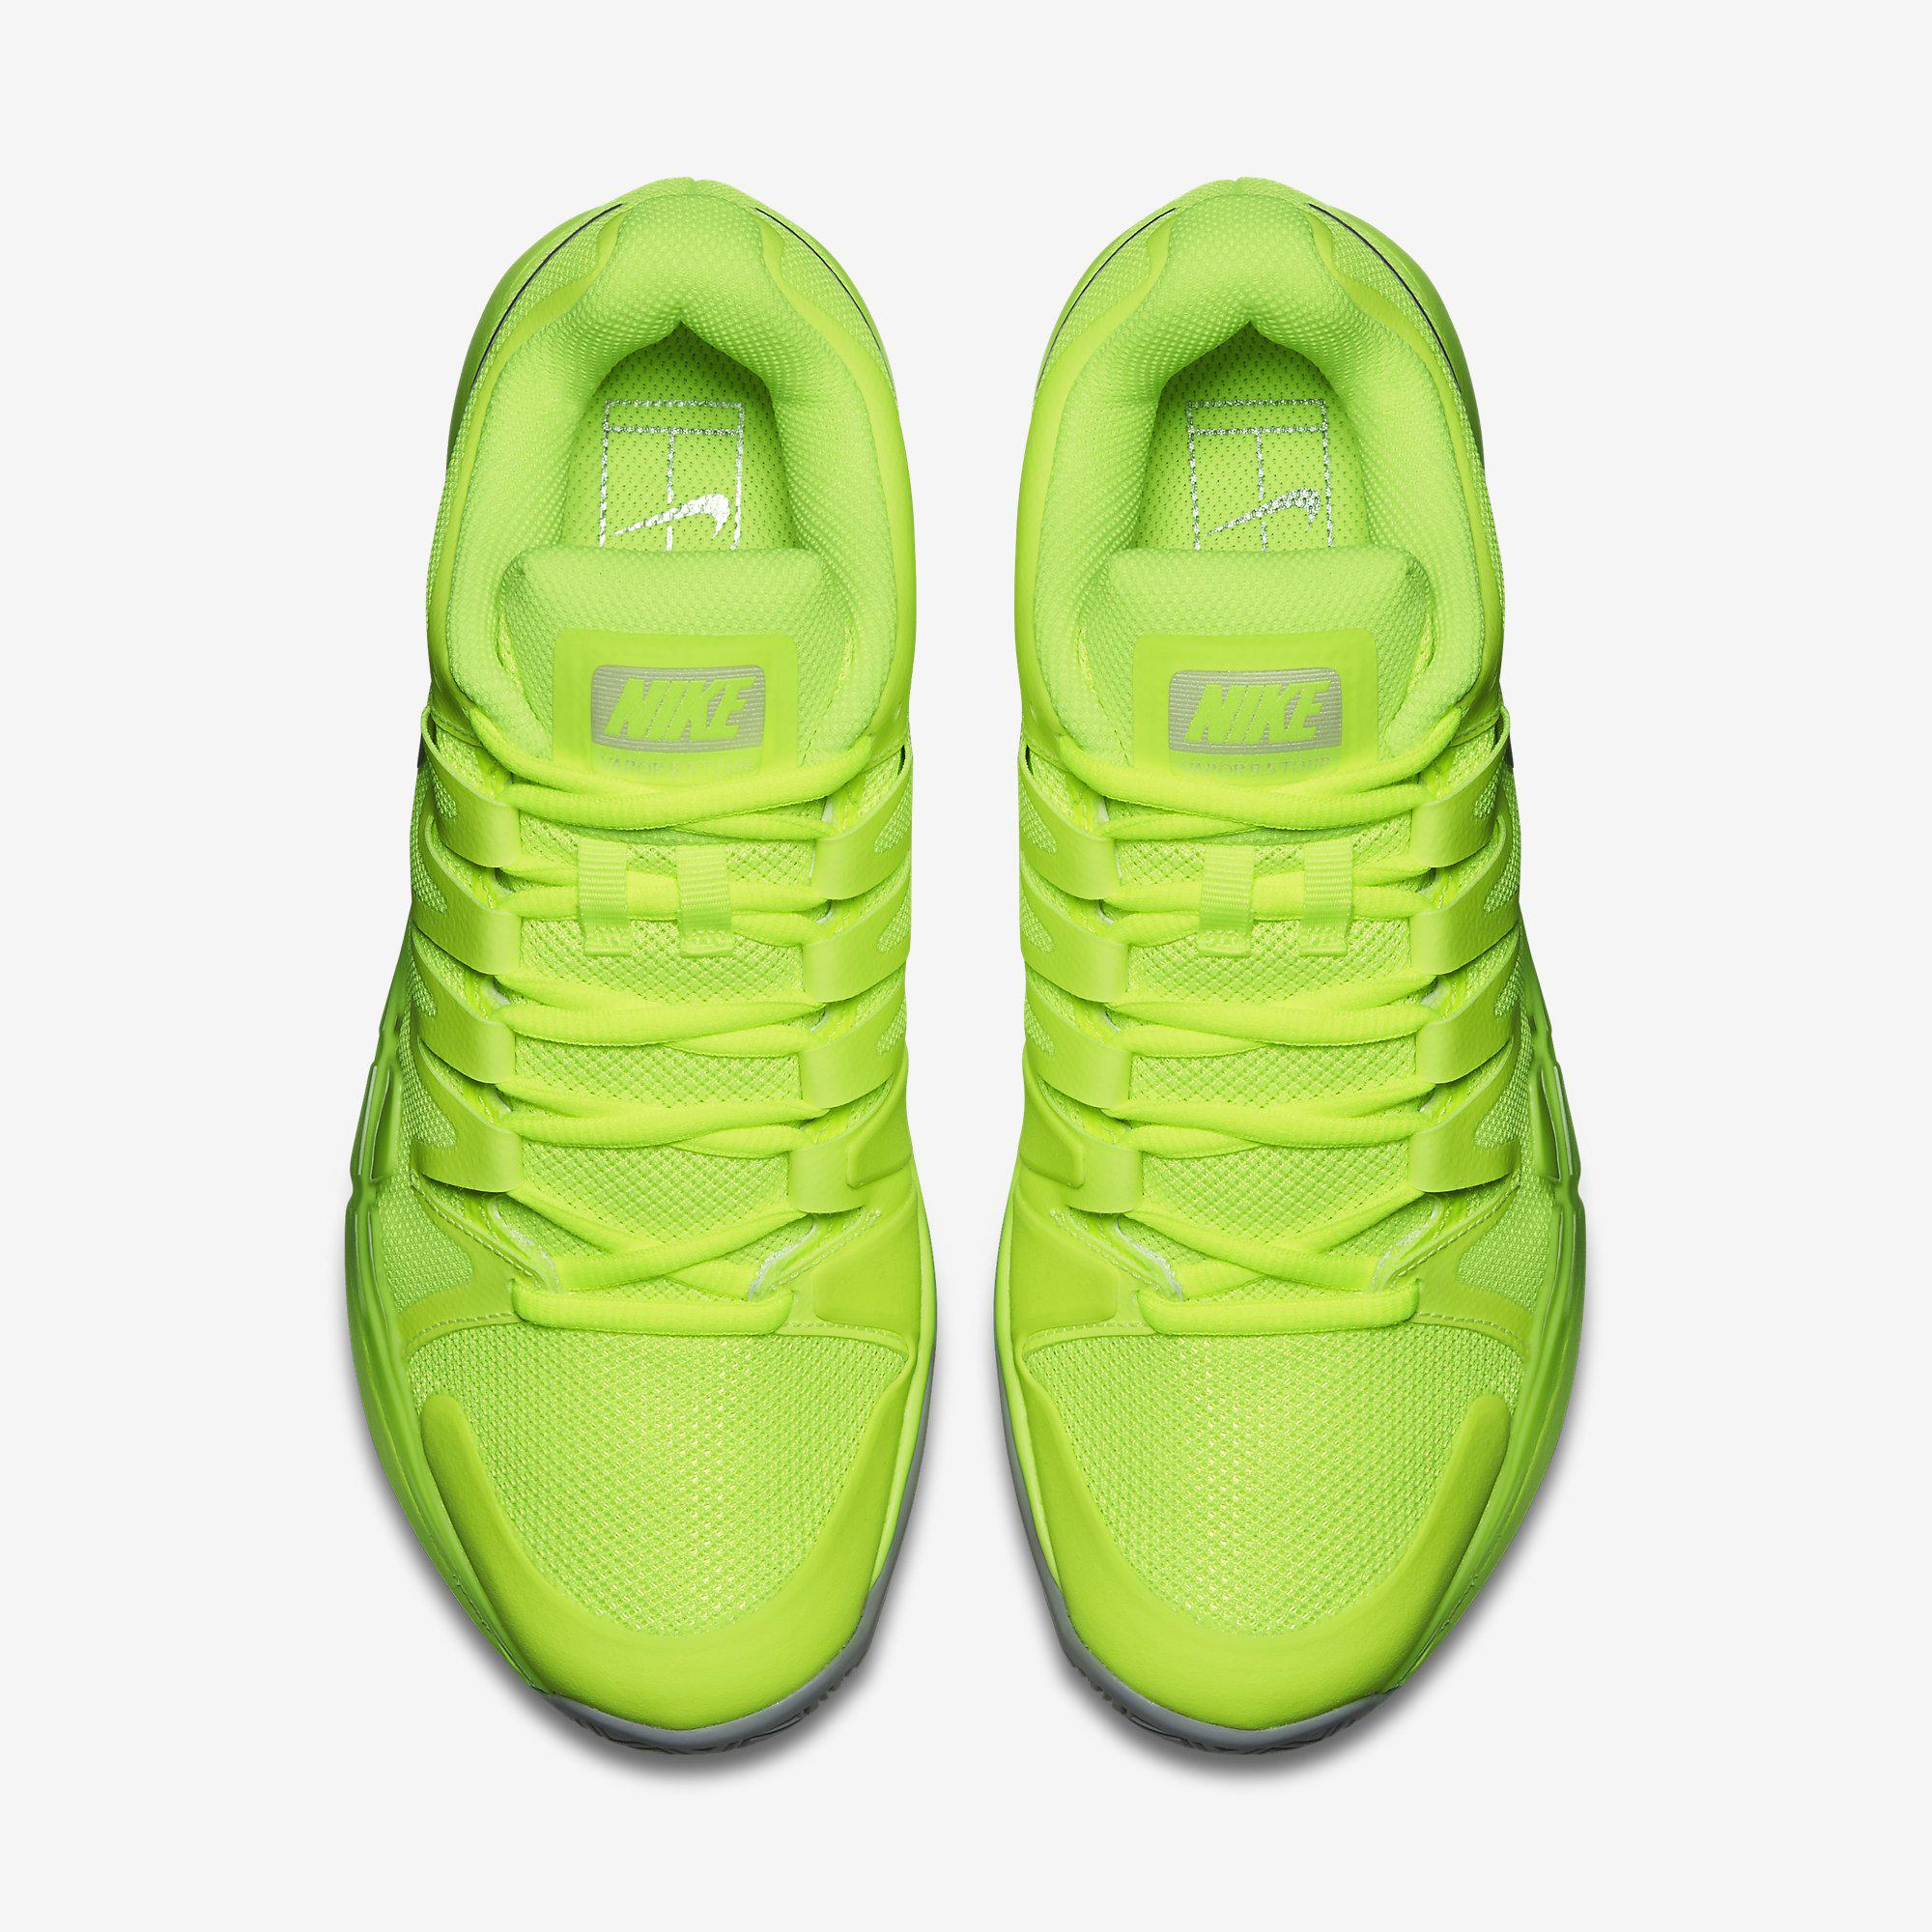 Nike Womens Zoom Vapor 9.5 Tennis Shoes - Volt Wolf Grey ... bea5e82c1